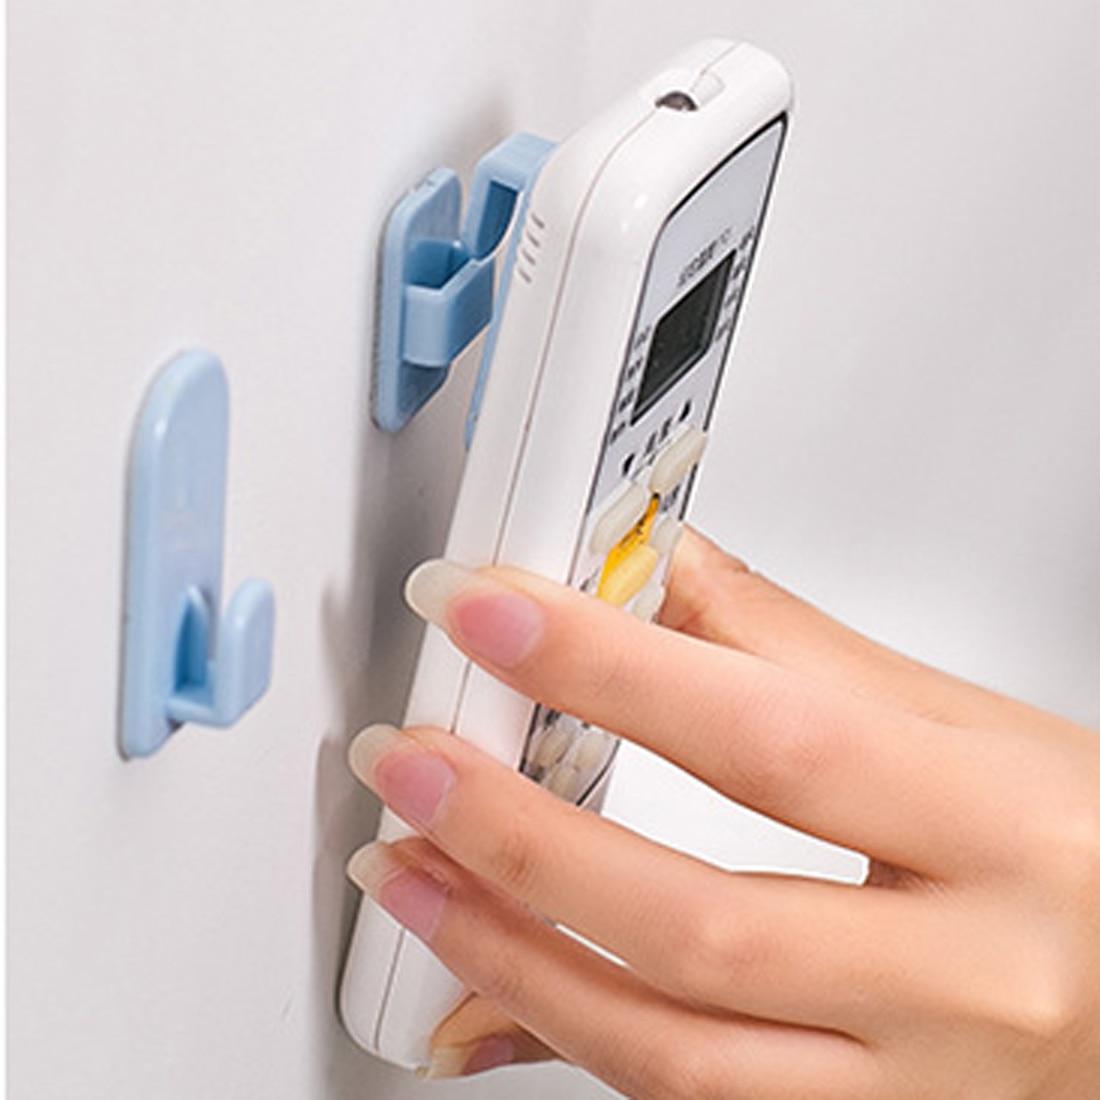 2Set(4Pcs) Self Adhesive Plastic Hooks Holder Remote Control Sticky Hook Hanger TV Air Conditioner Key Wall Storage